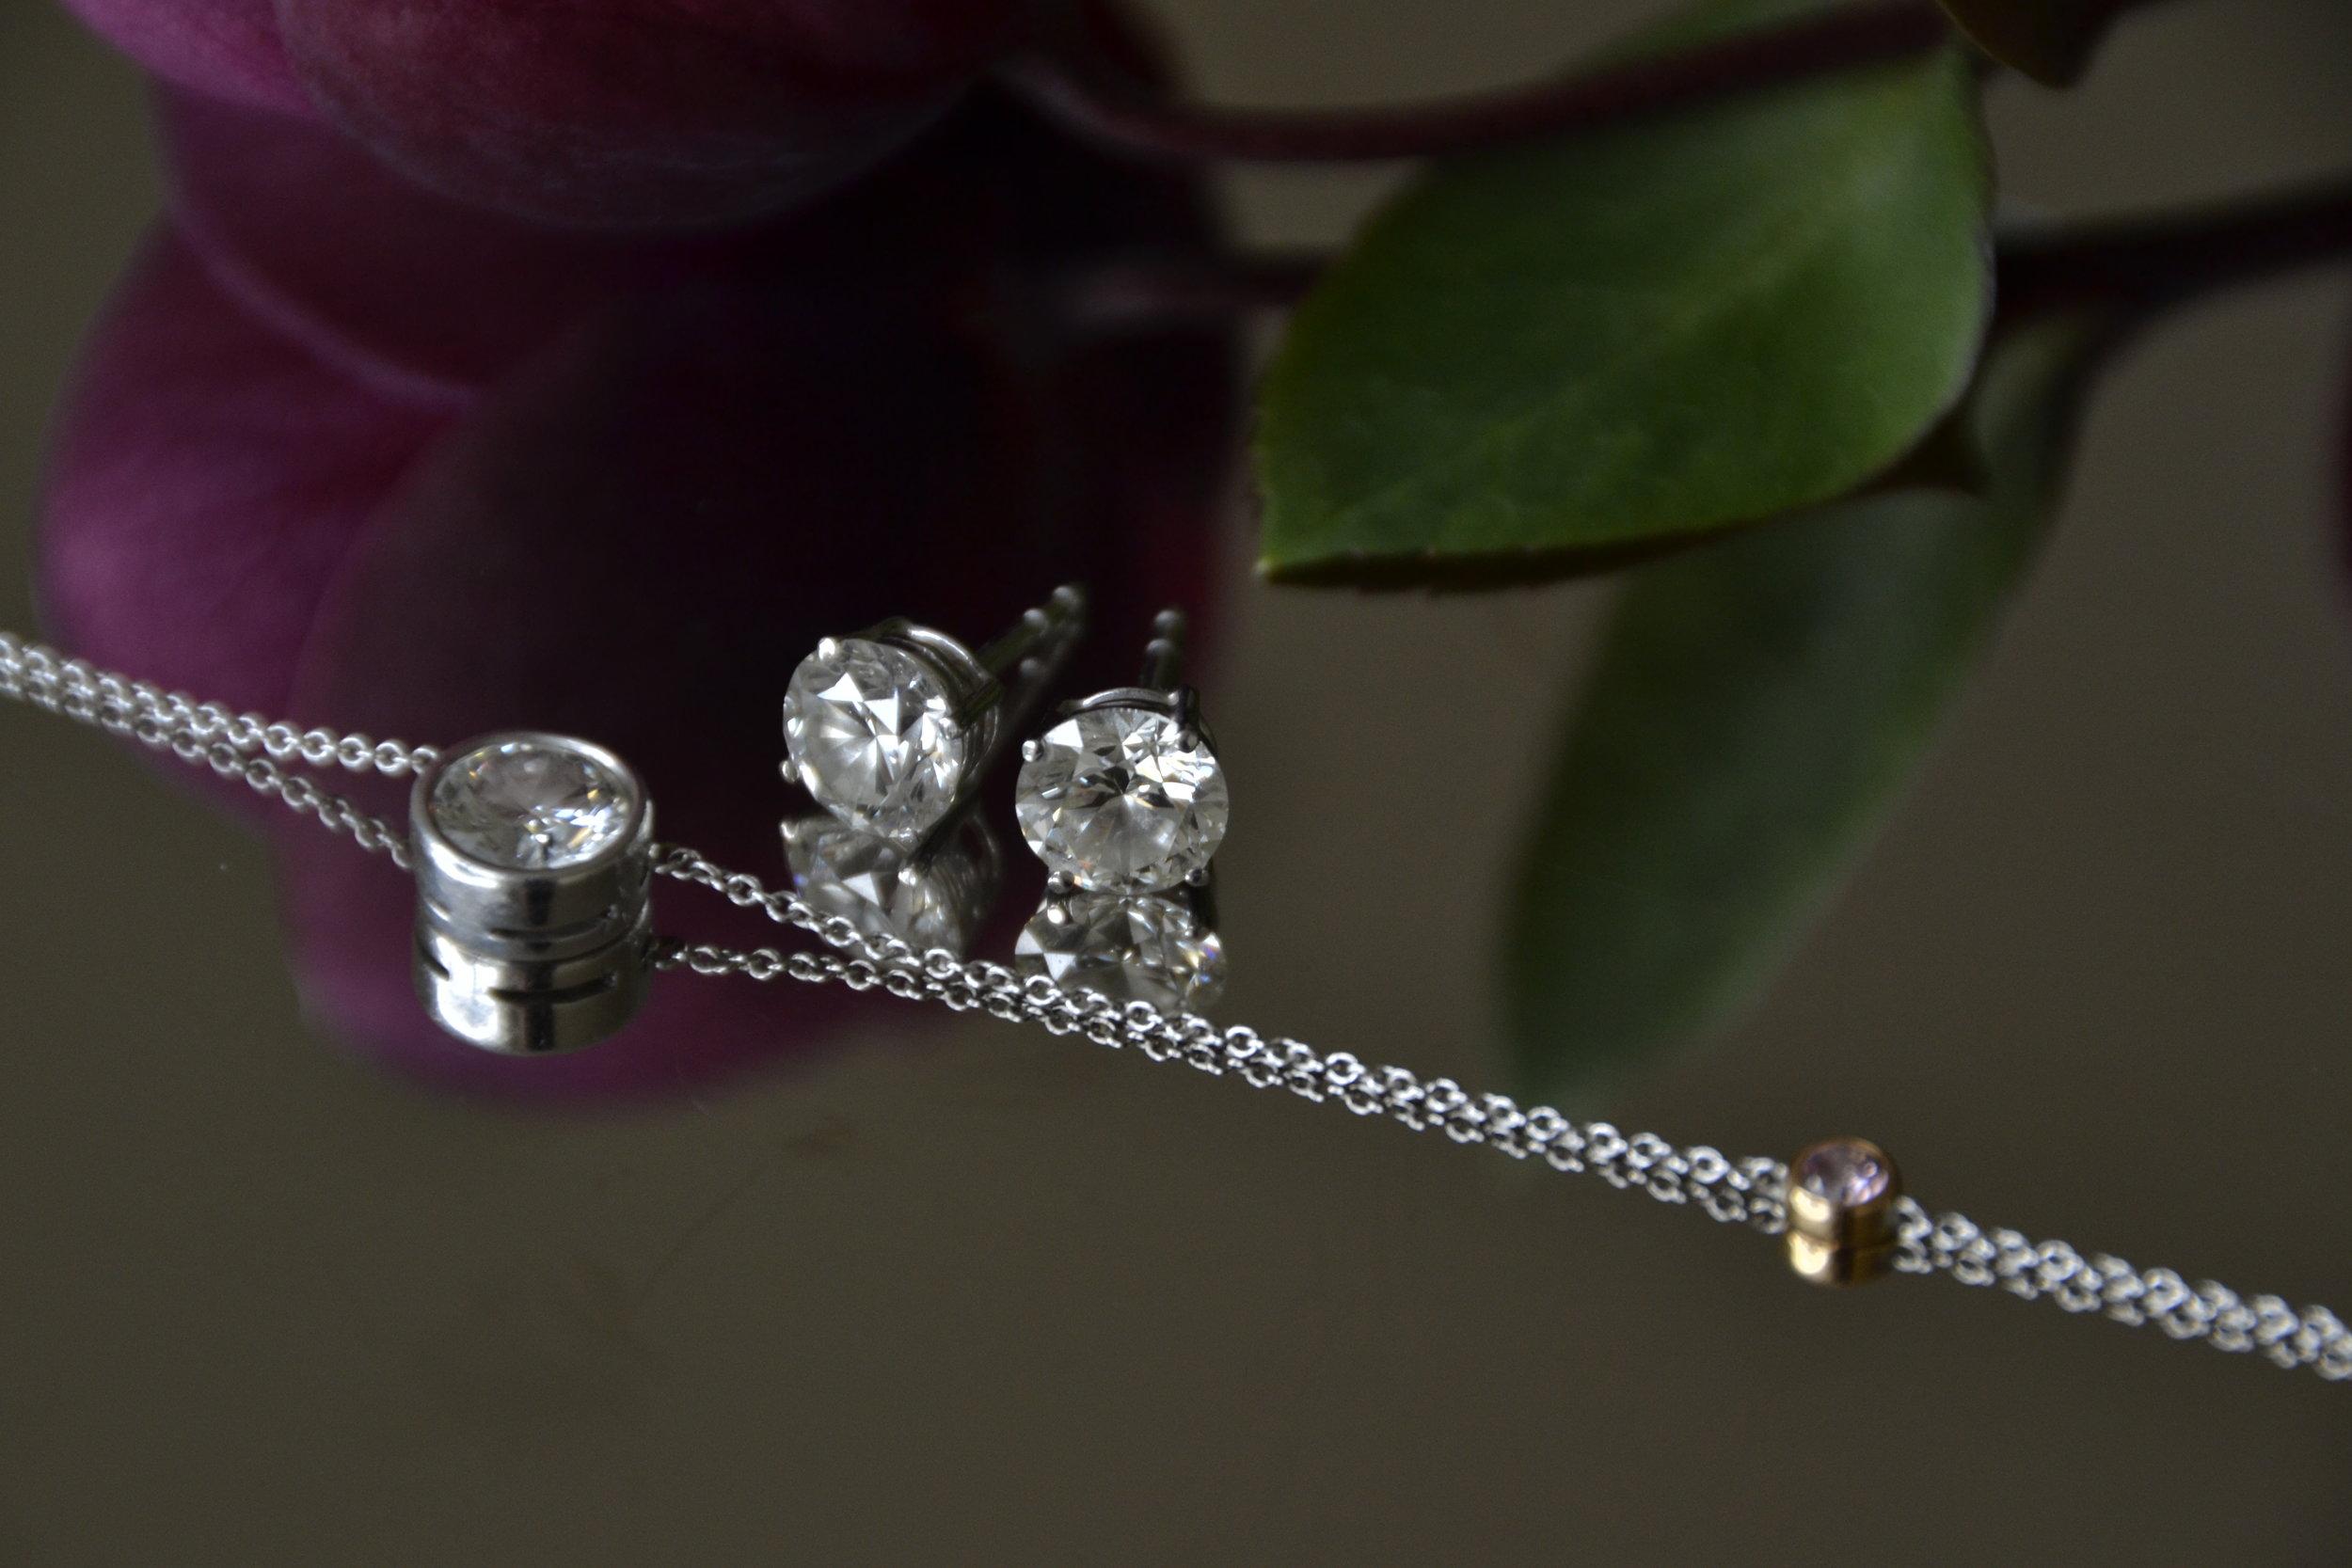 Diamond solitaire earrings, and diamond pendant